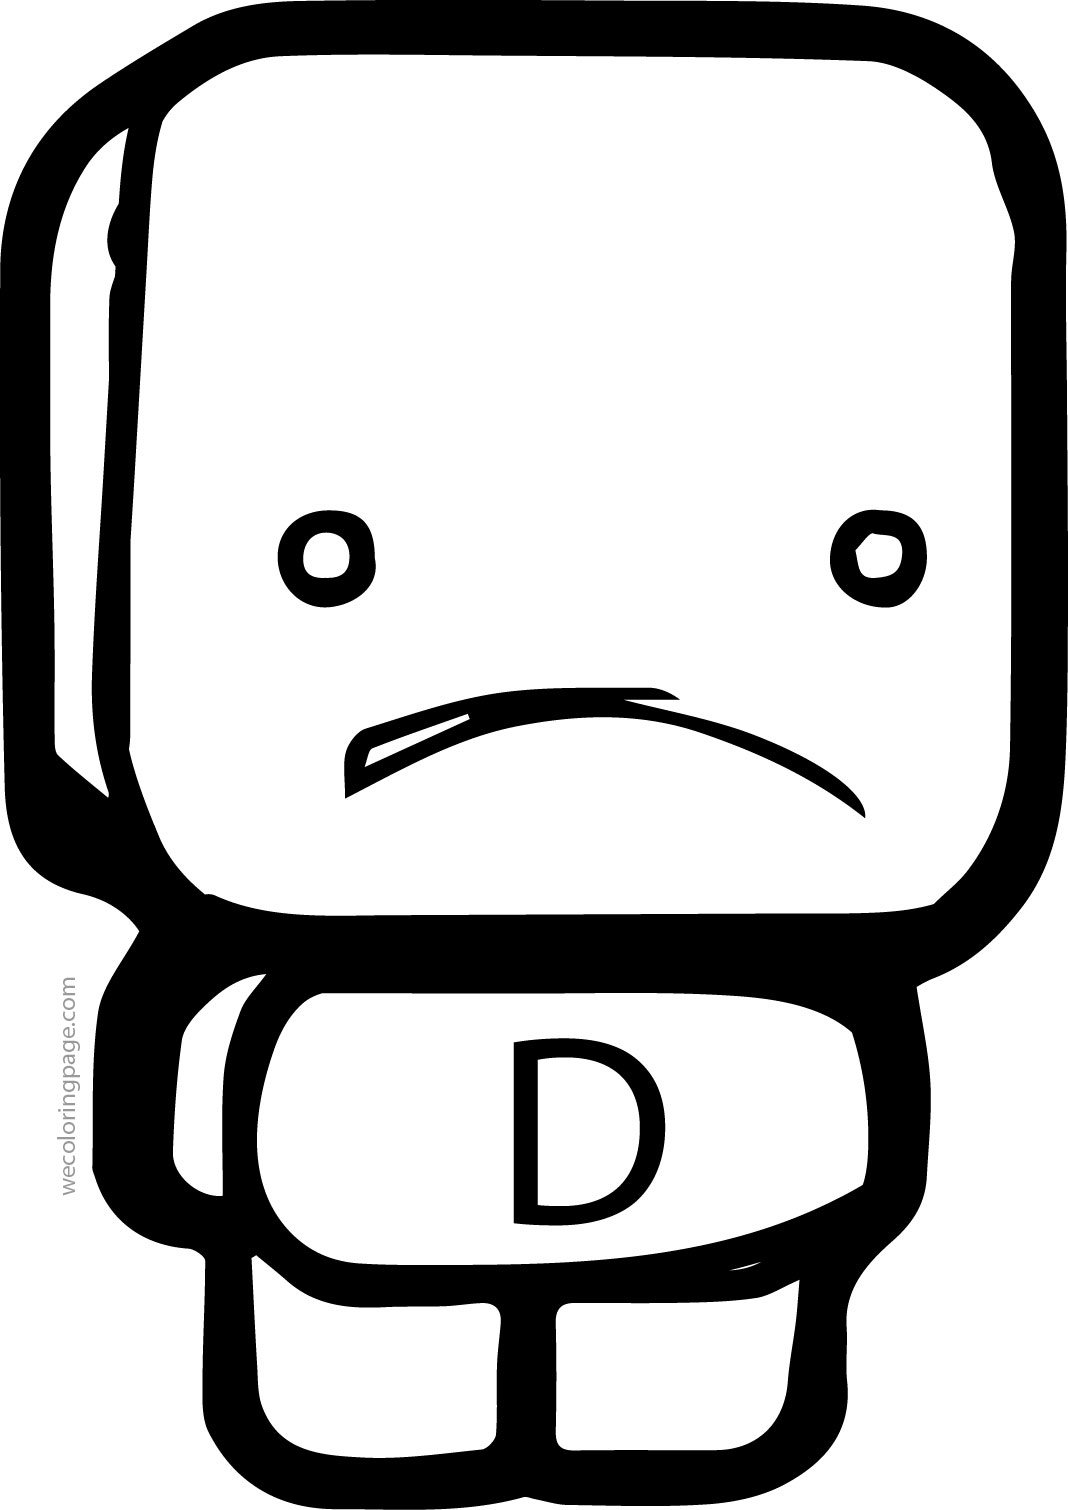 Cube Figure D Letter Coloring Page